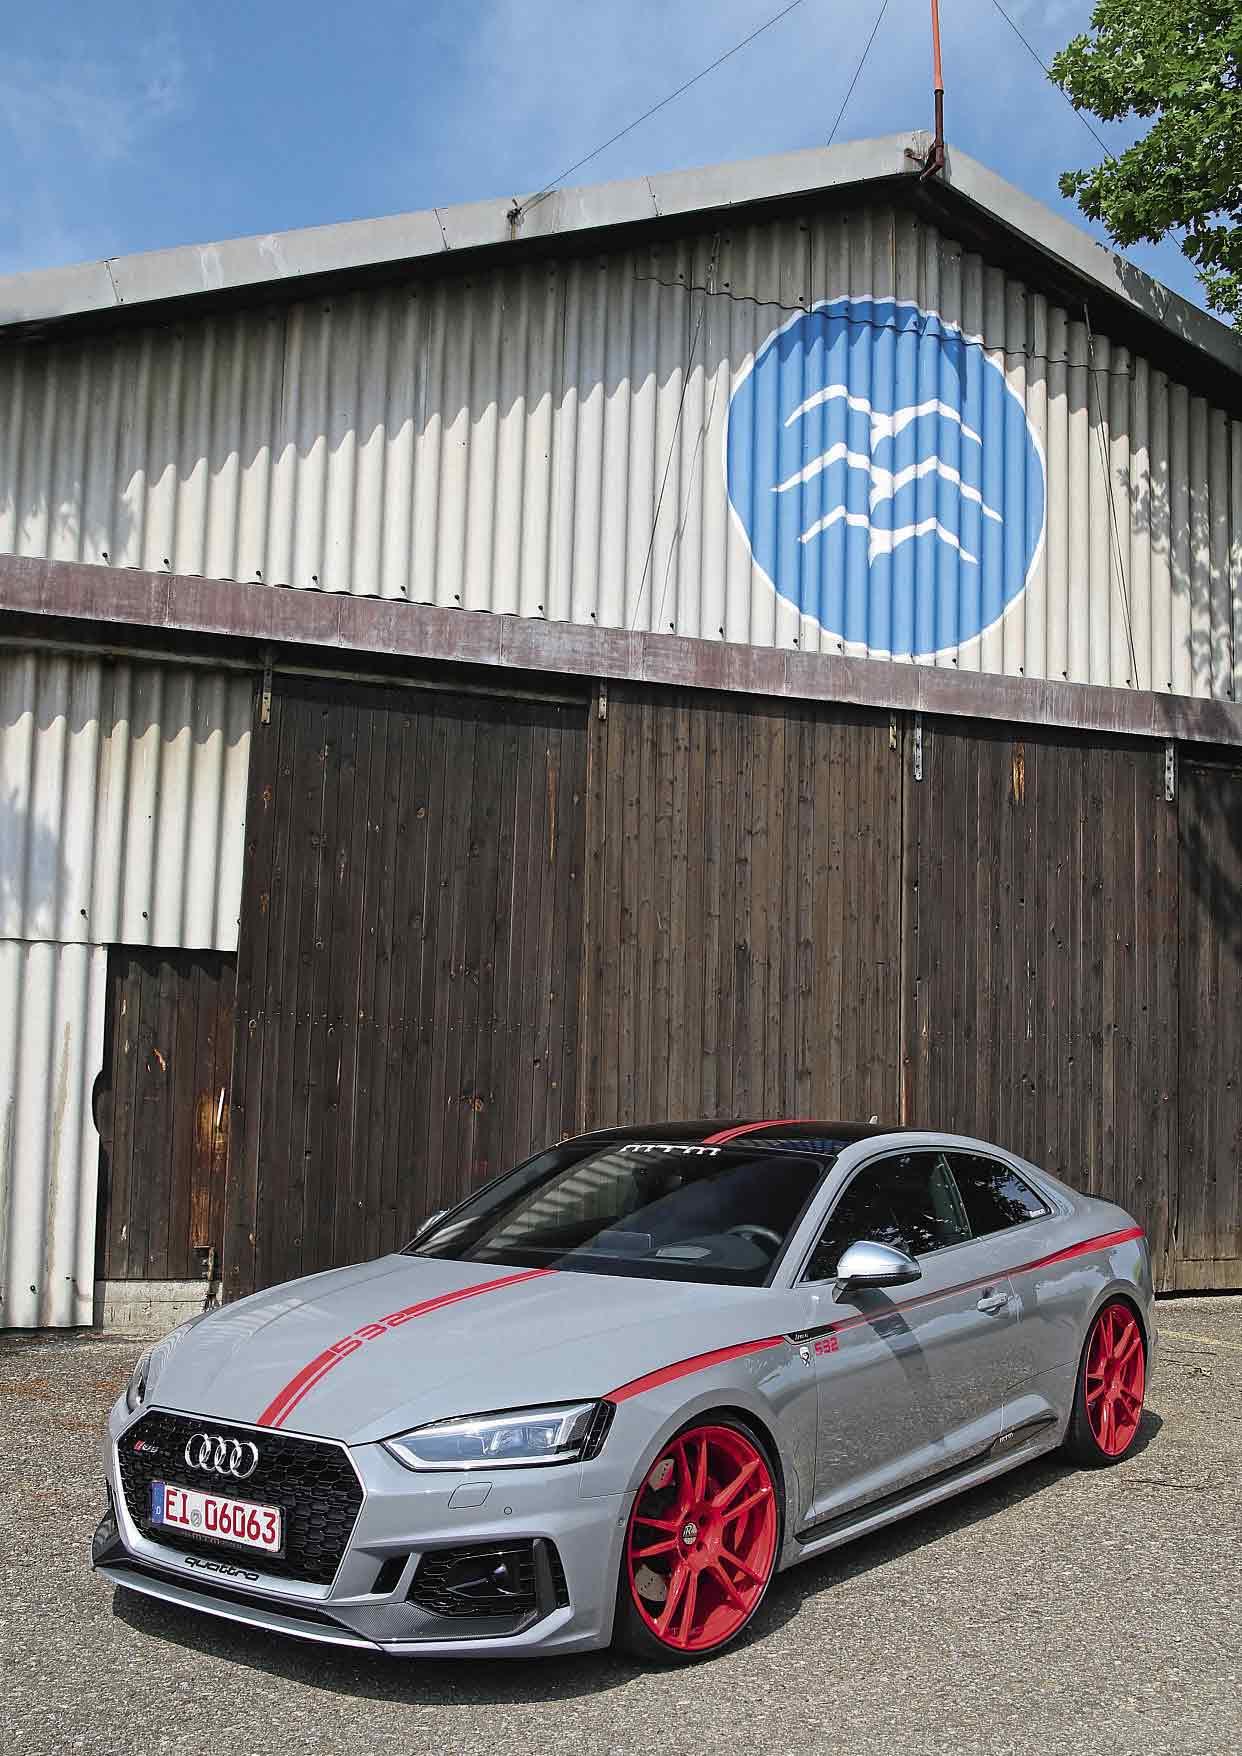 2019 Audi RS5-R F5 MTM-tuned 552hp - Drive-My Blogs - Drive